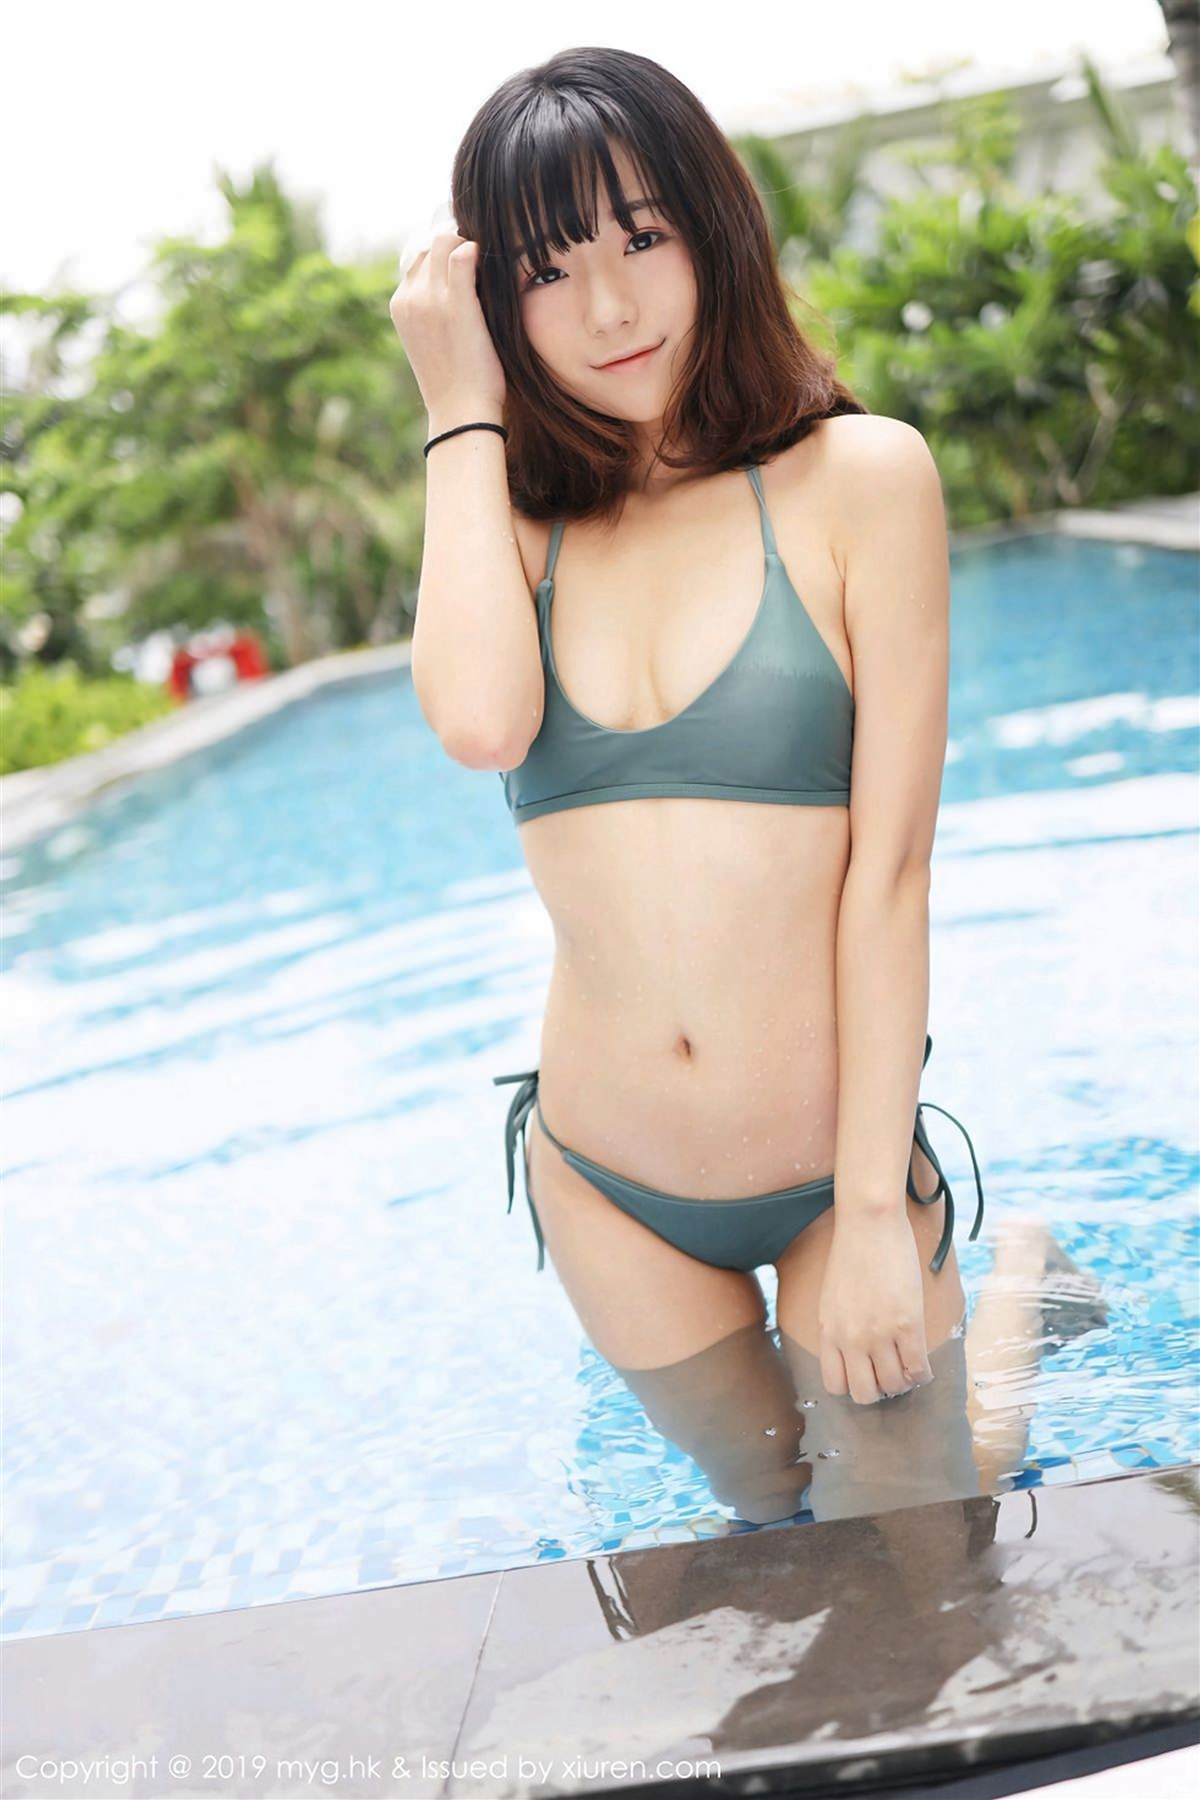 MyGirl Vol.362 12P, Cang Jing You Xiang, mygirl